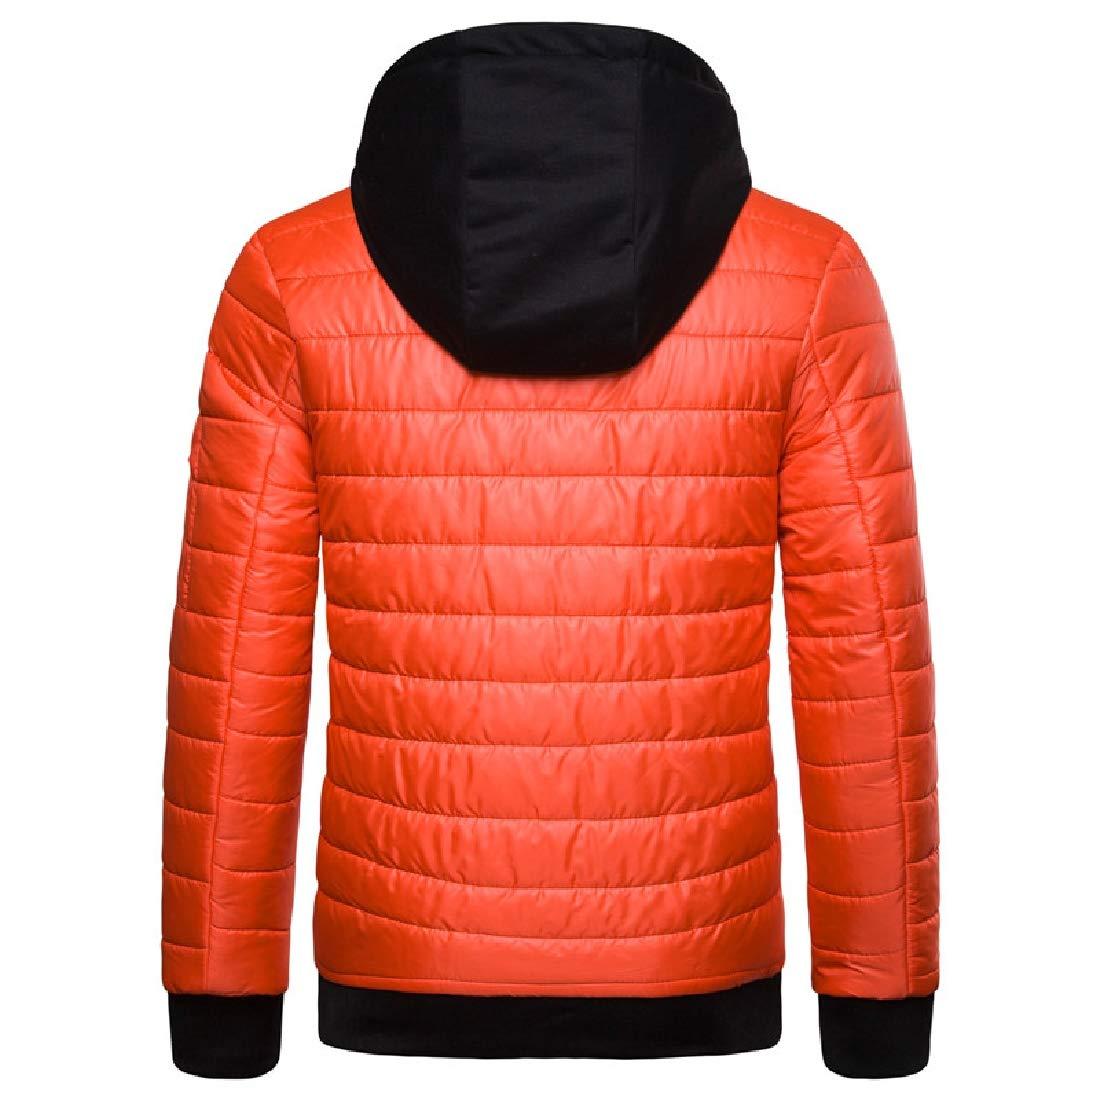 YUNY Mens Ultra Light Weight Slim Fit Hoodie Warm Zip-Up Anorak Jacket Orange M